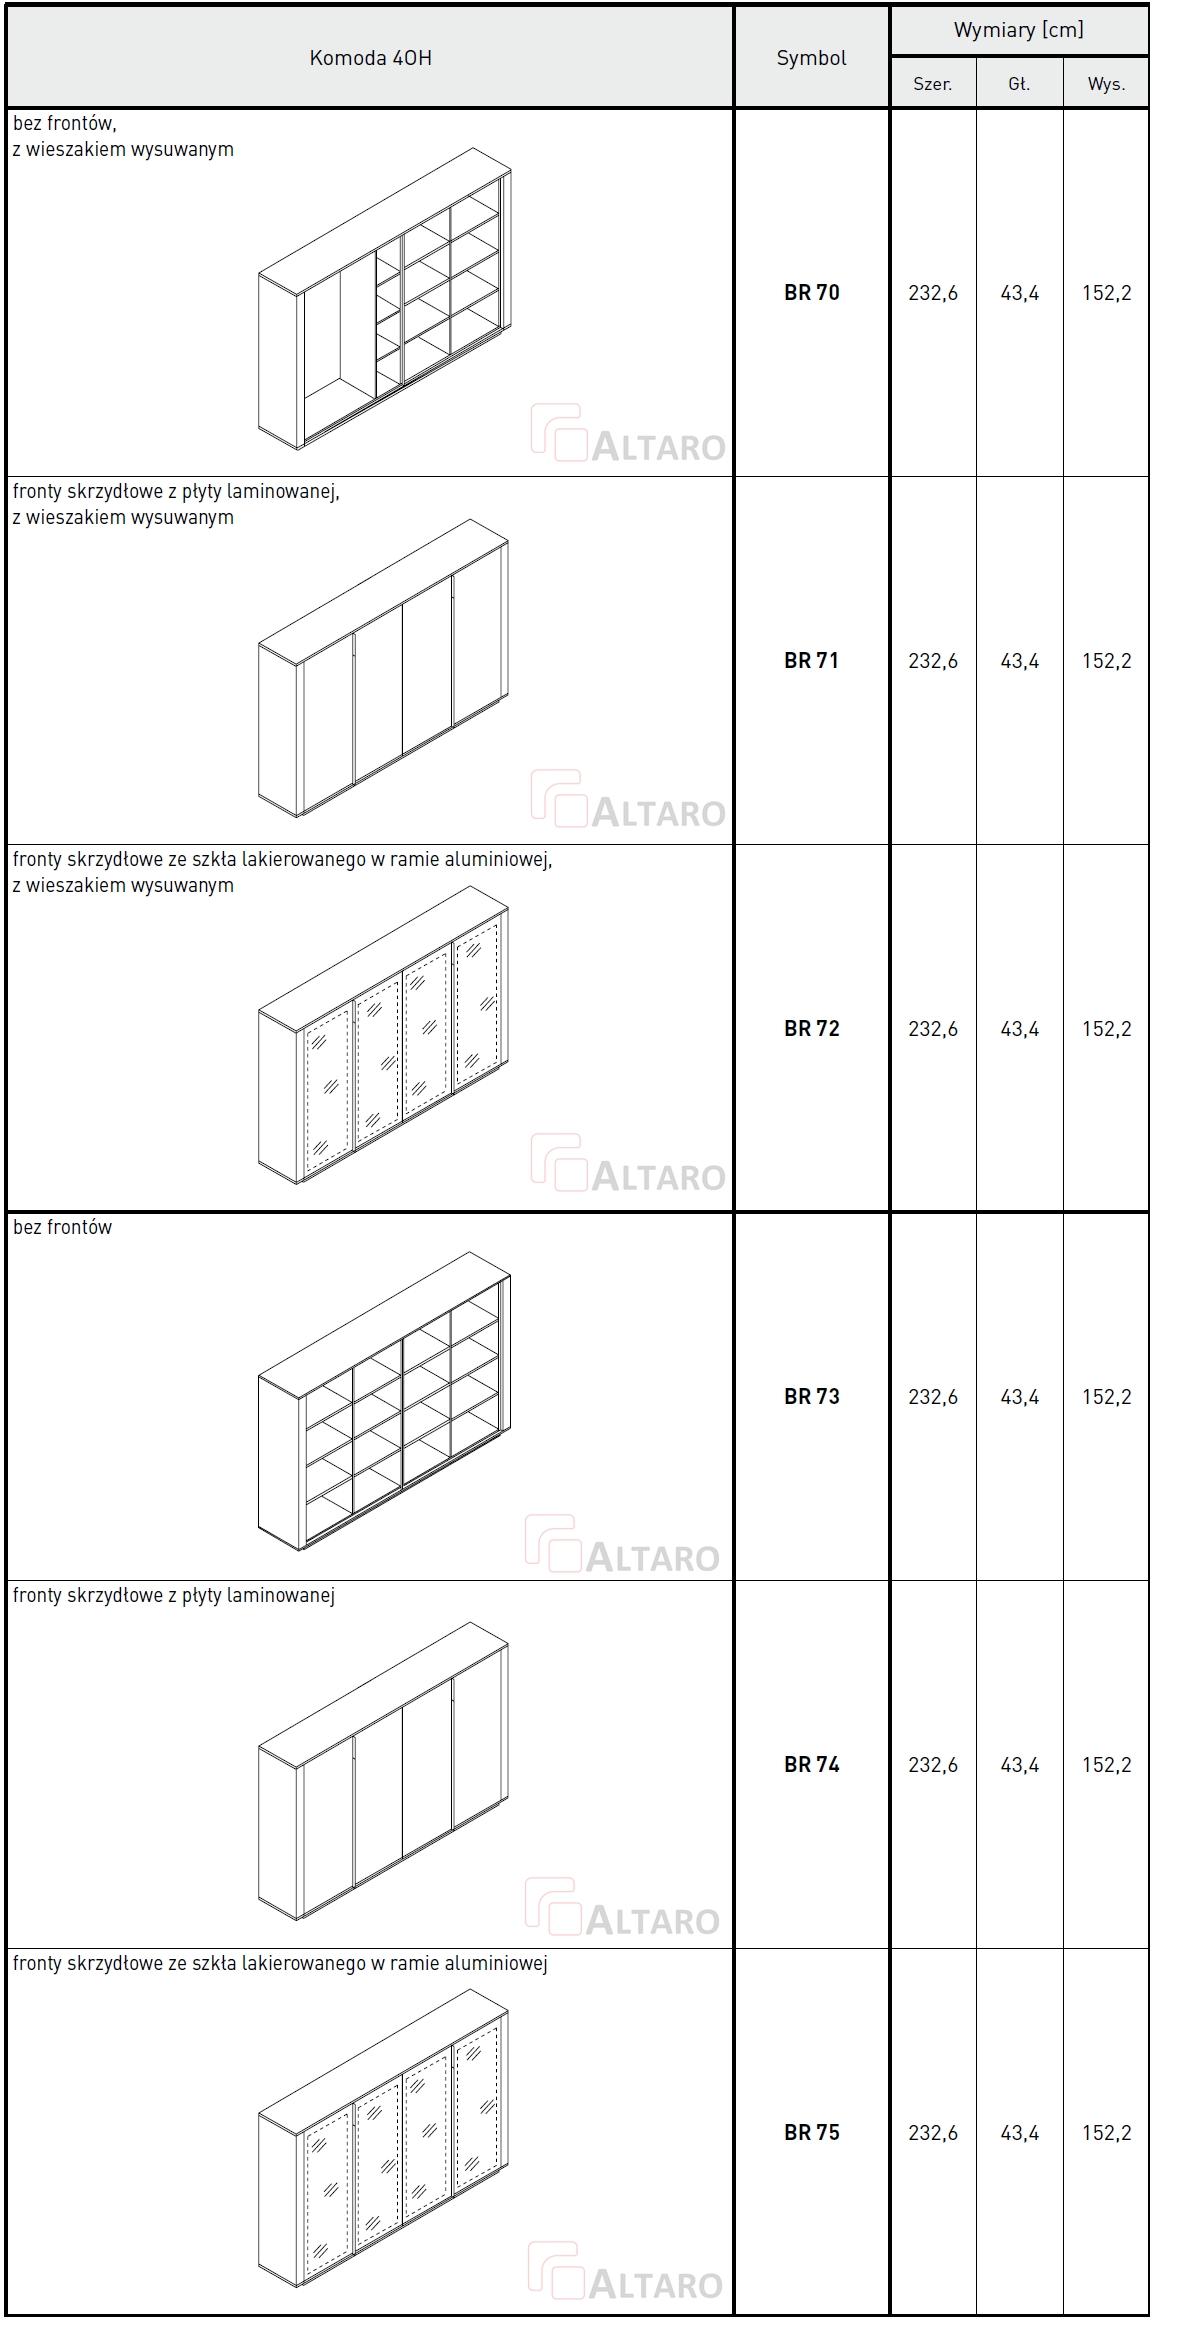 meble gabinetowe BRAND katalog v11 ALTARO